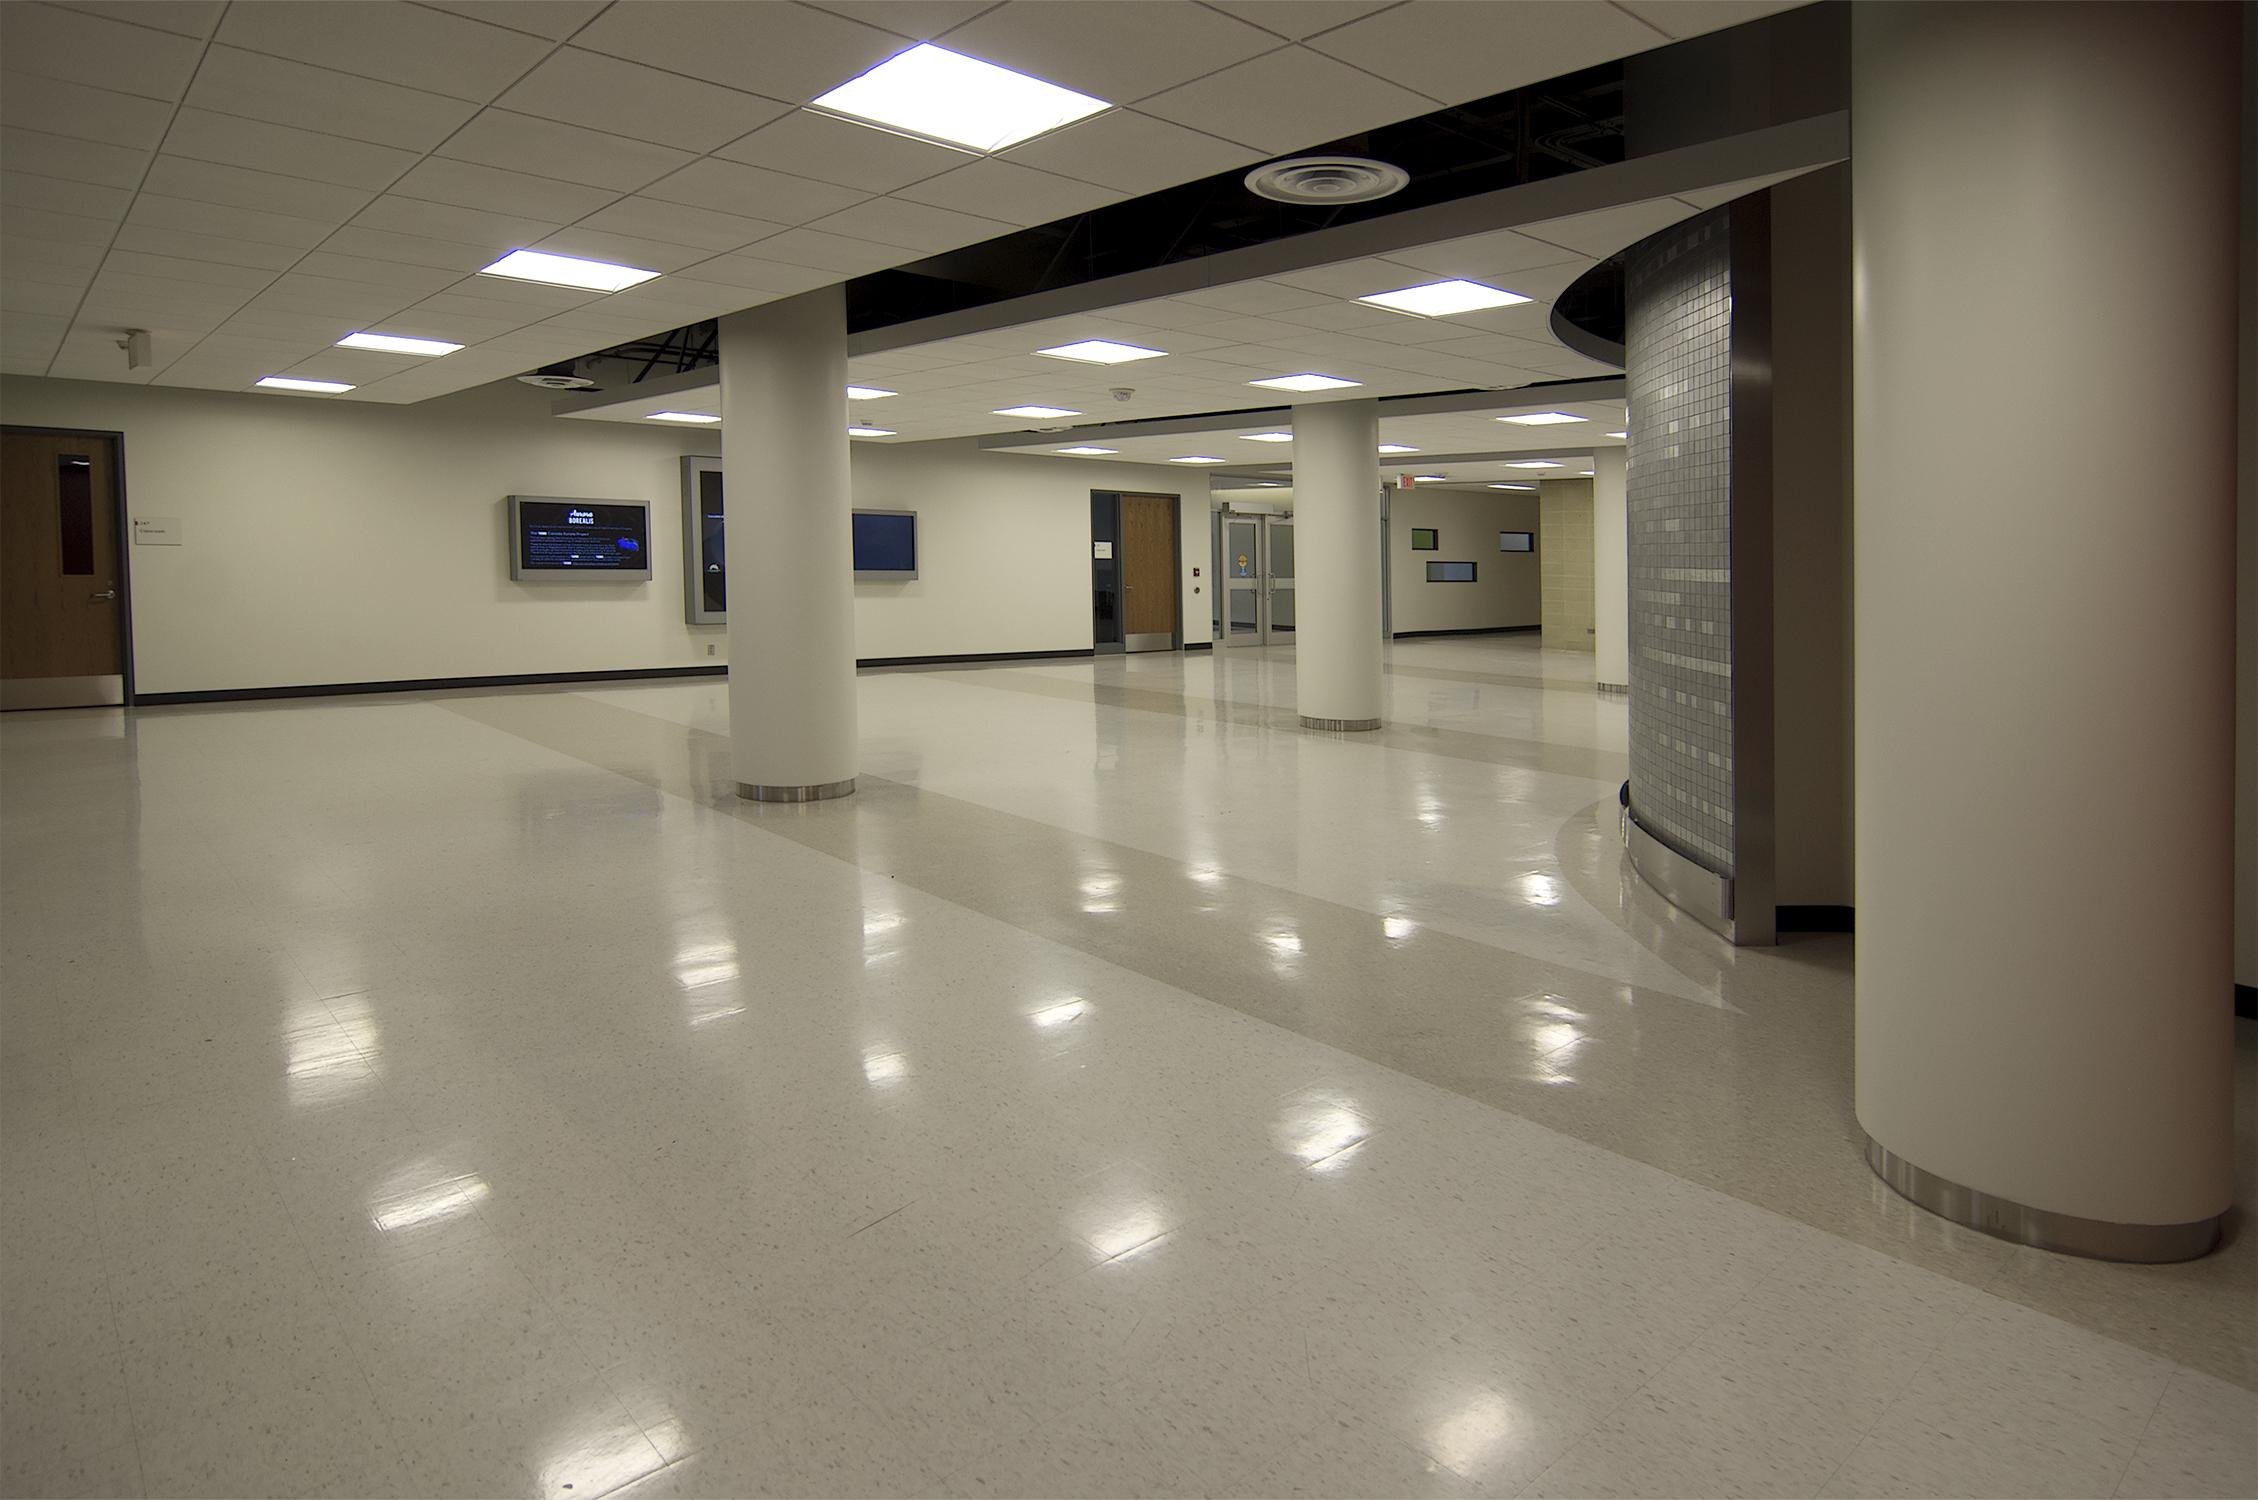 Science A - main floor circulation space